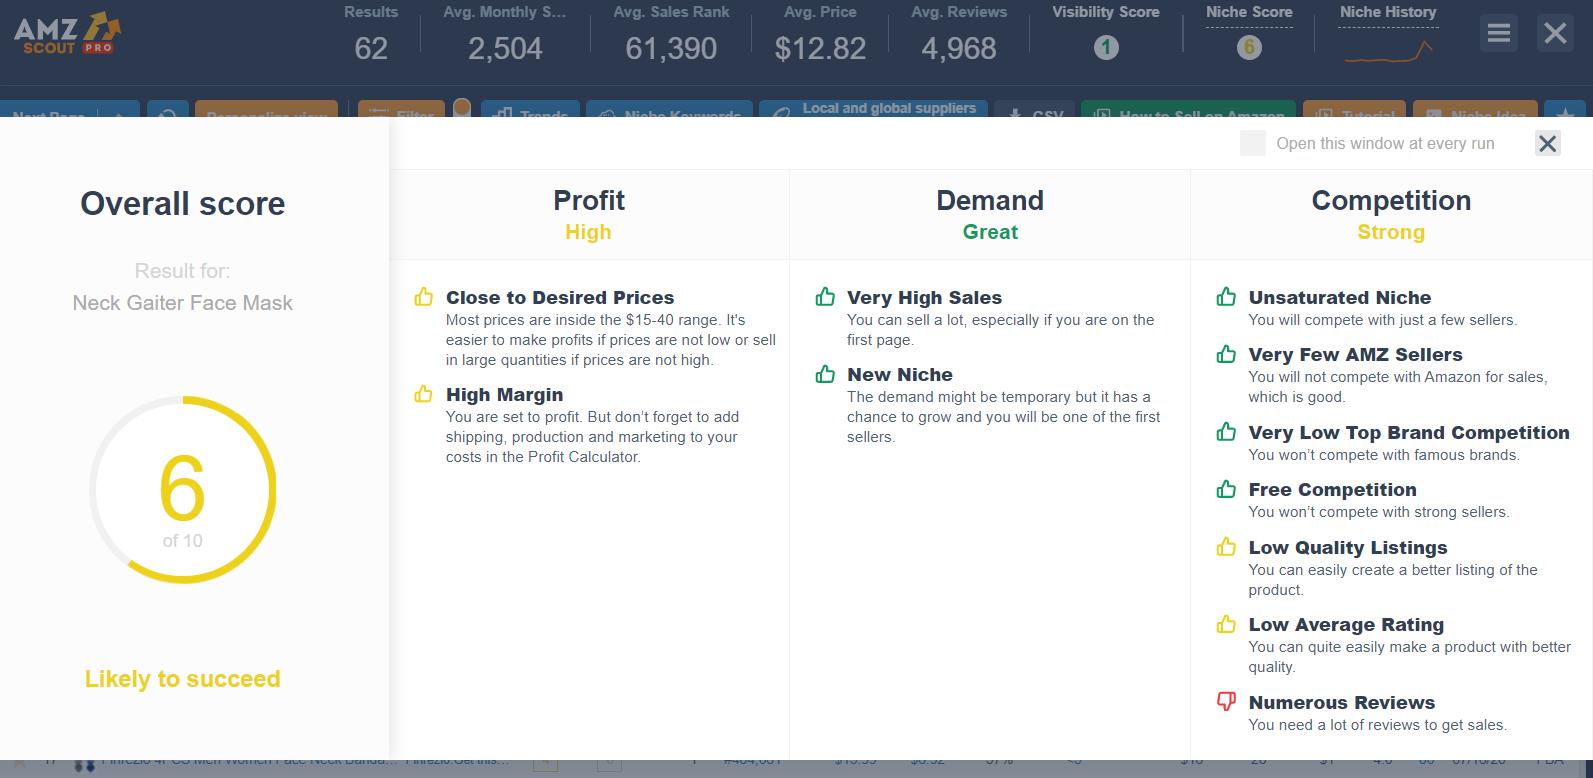 amz-scout-score-interface